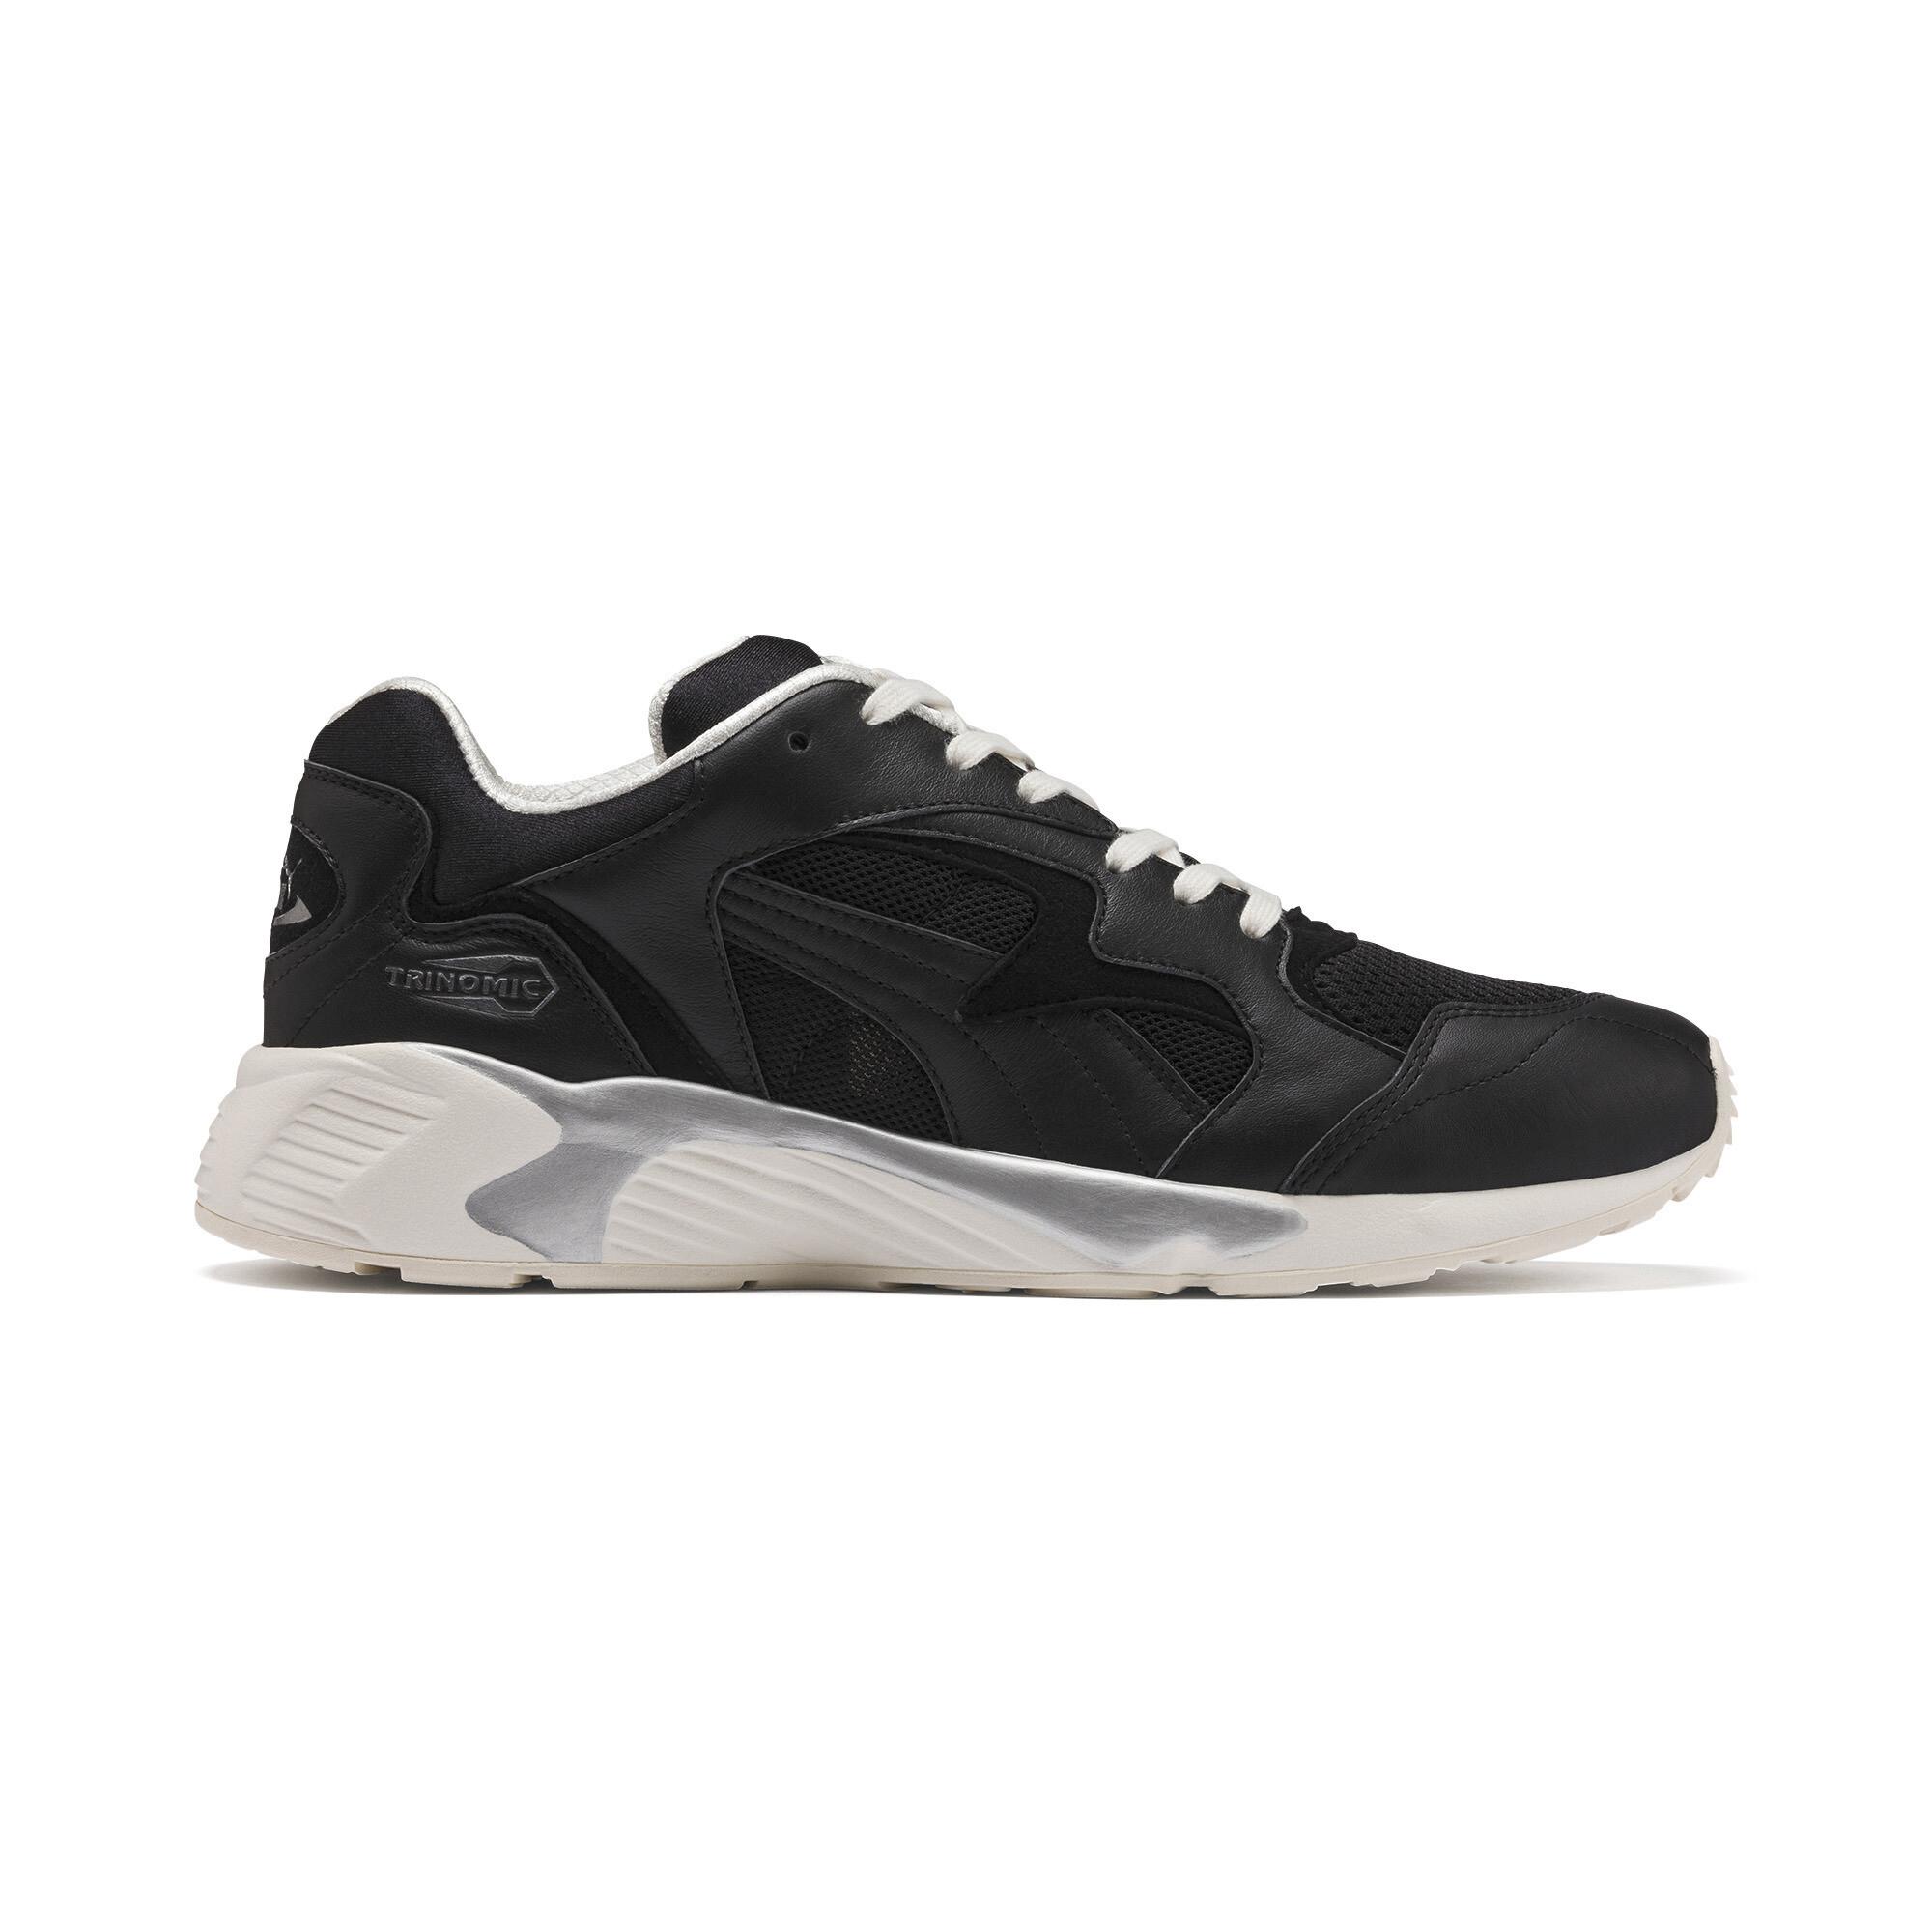 PUMA-Prevail-IR-Reality-Sneakers-Unisex-Shoe thumbnail 12